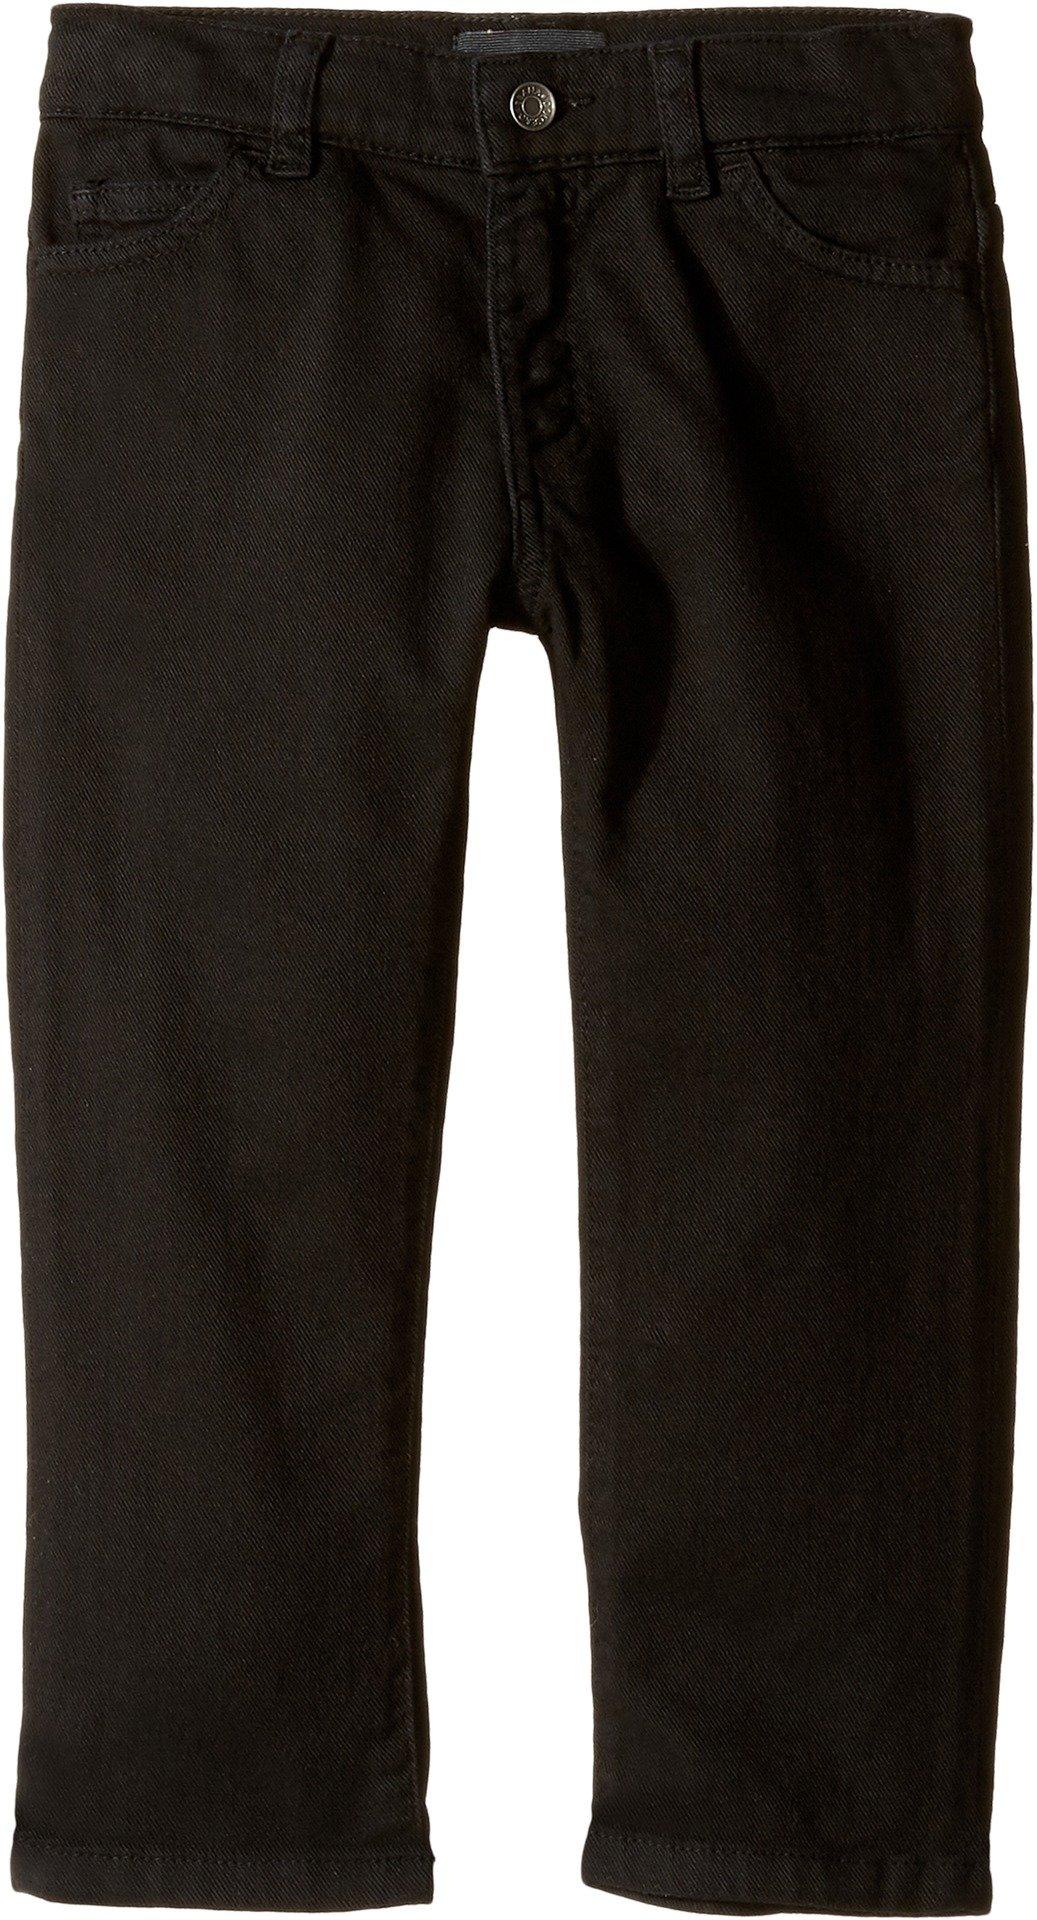 Dolce & Gabbana Kids Baby Boy's Stretch Jeans (Toddler/Little Kids) Black Jeans